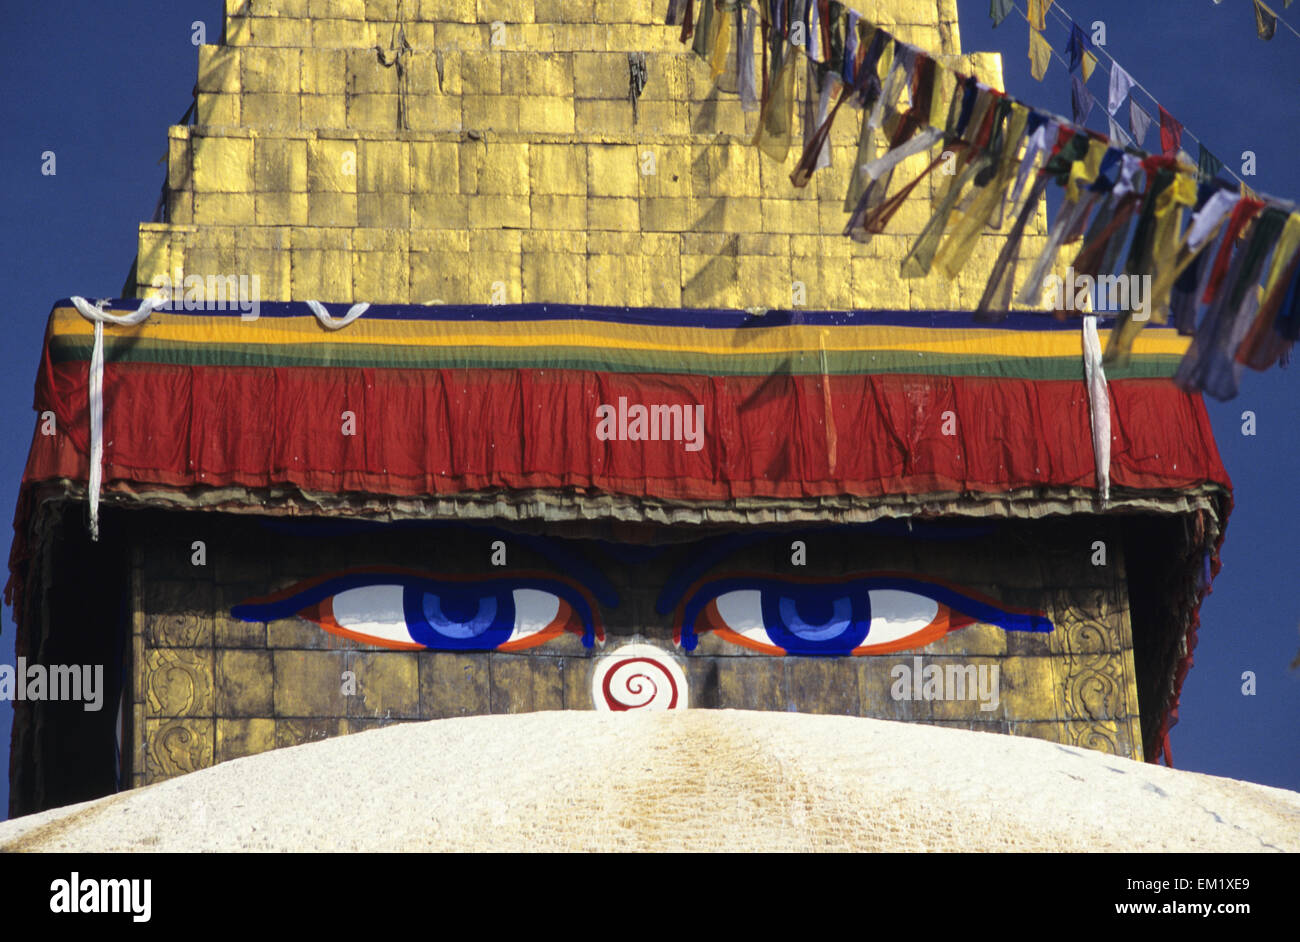 Nepal, Close-up of painted eyes on Boudhanath Stupa and colorful streaming flags; Kathmandu - Stock Image